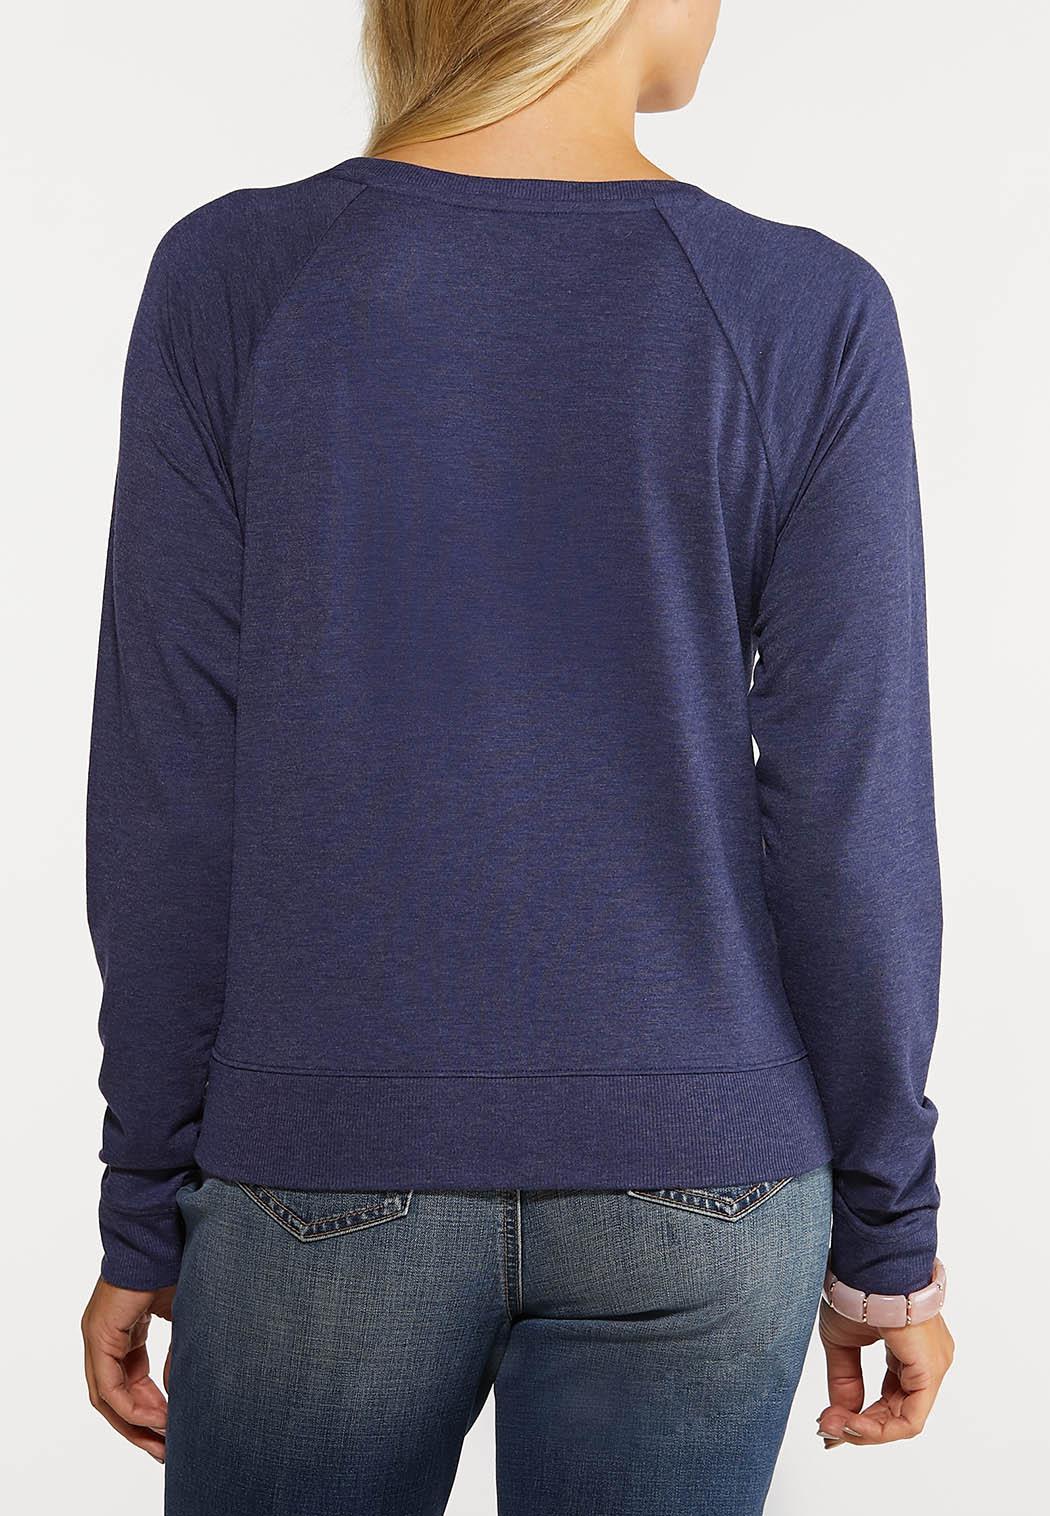 Amazing Grace Sweatshirt (Item #44089642)